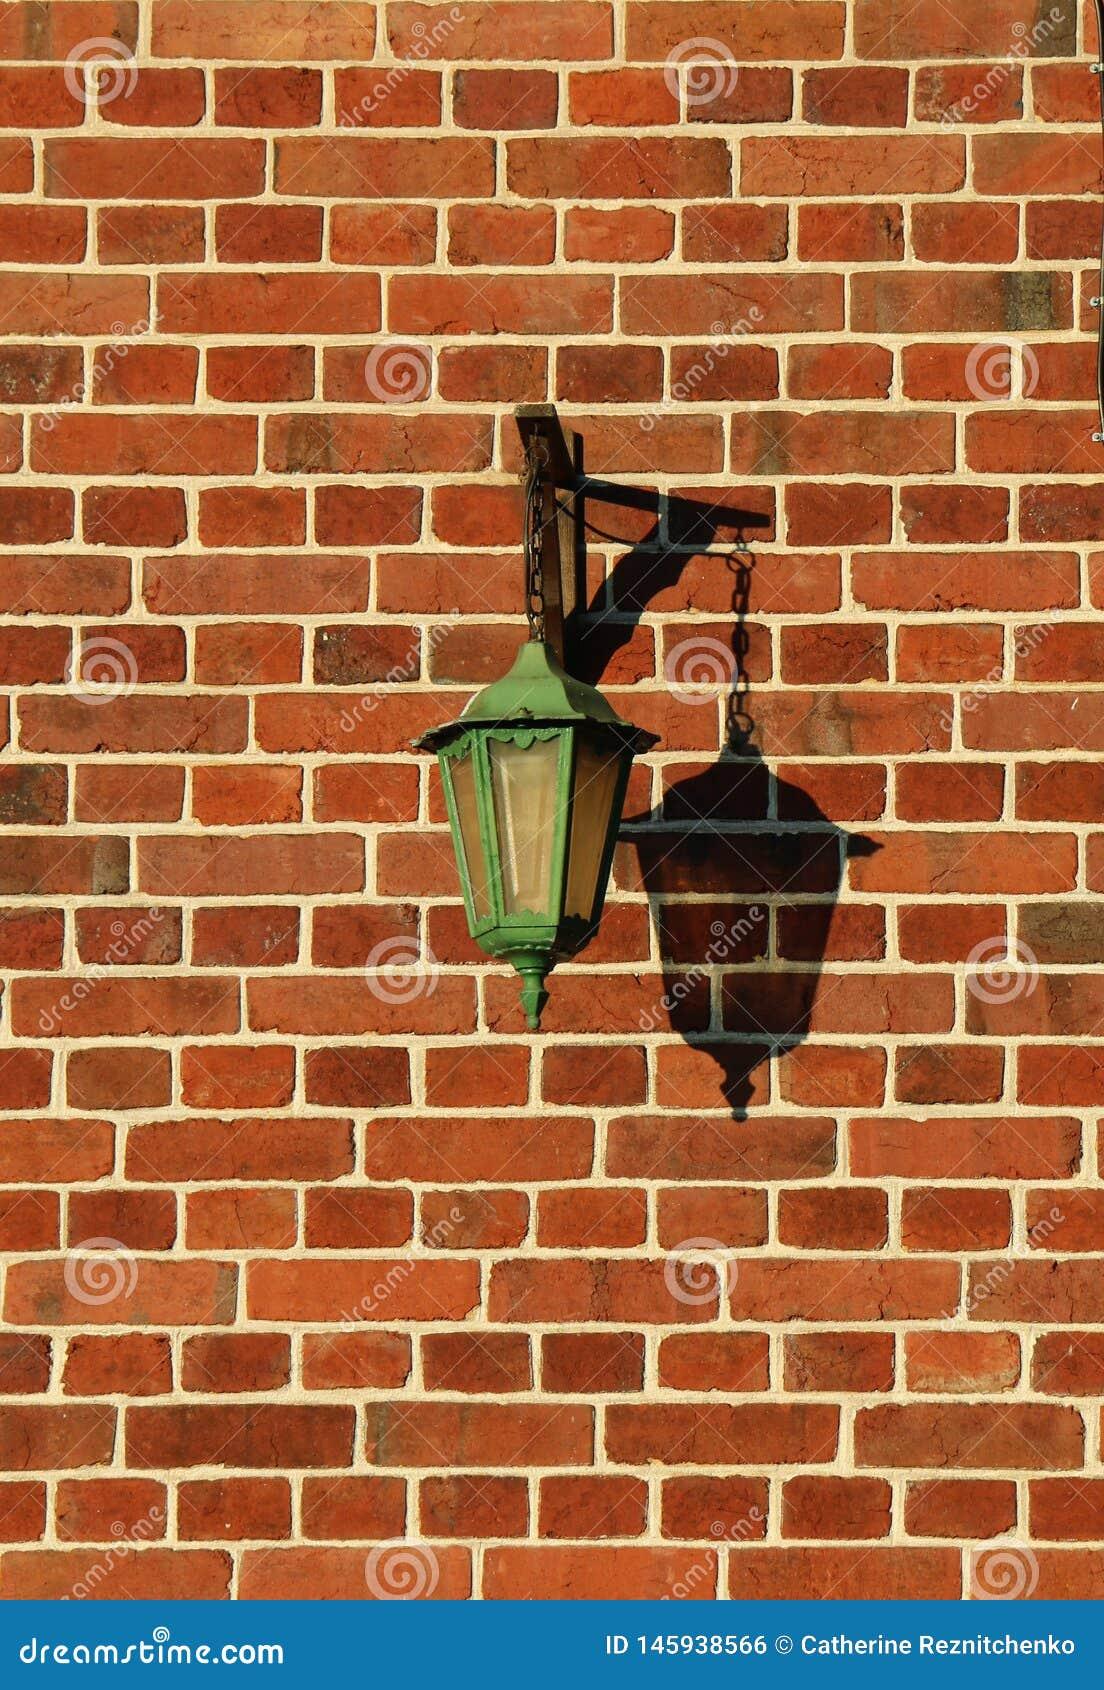 Rougar för briques för en för mur för Lampadaire normandsur